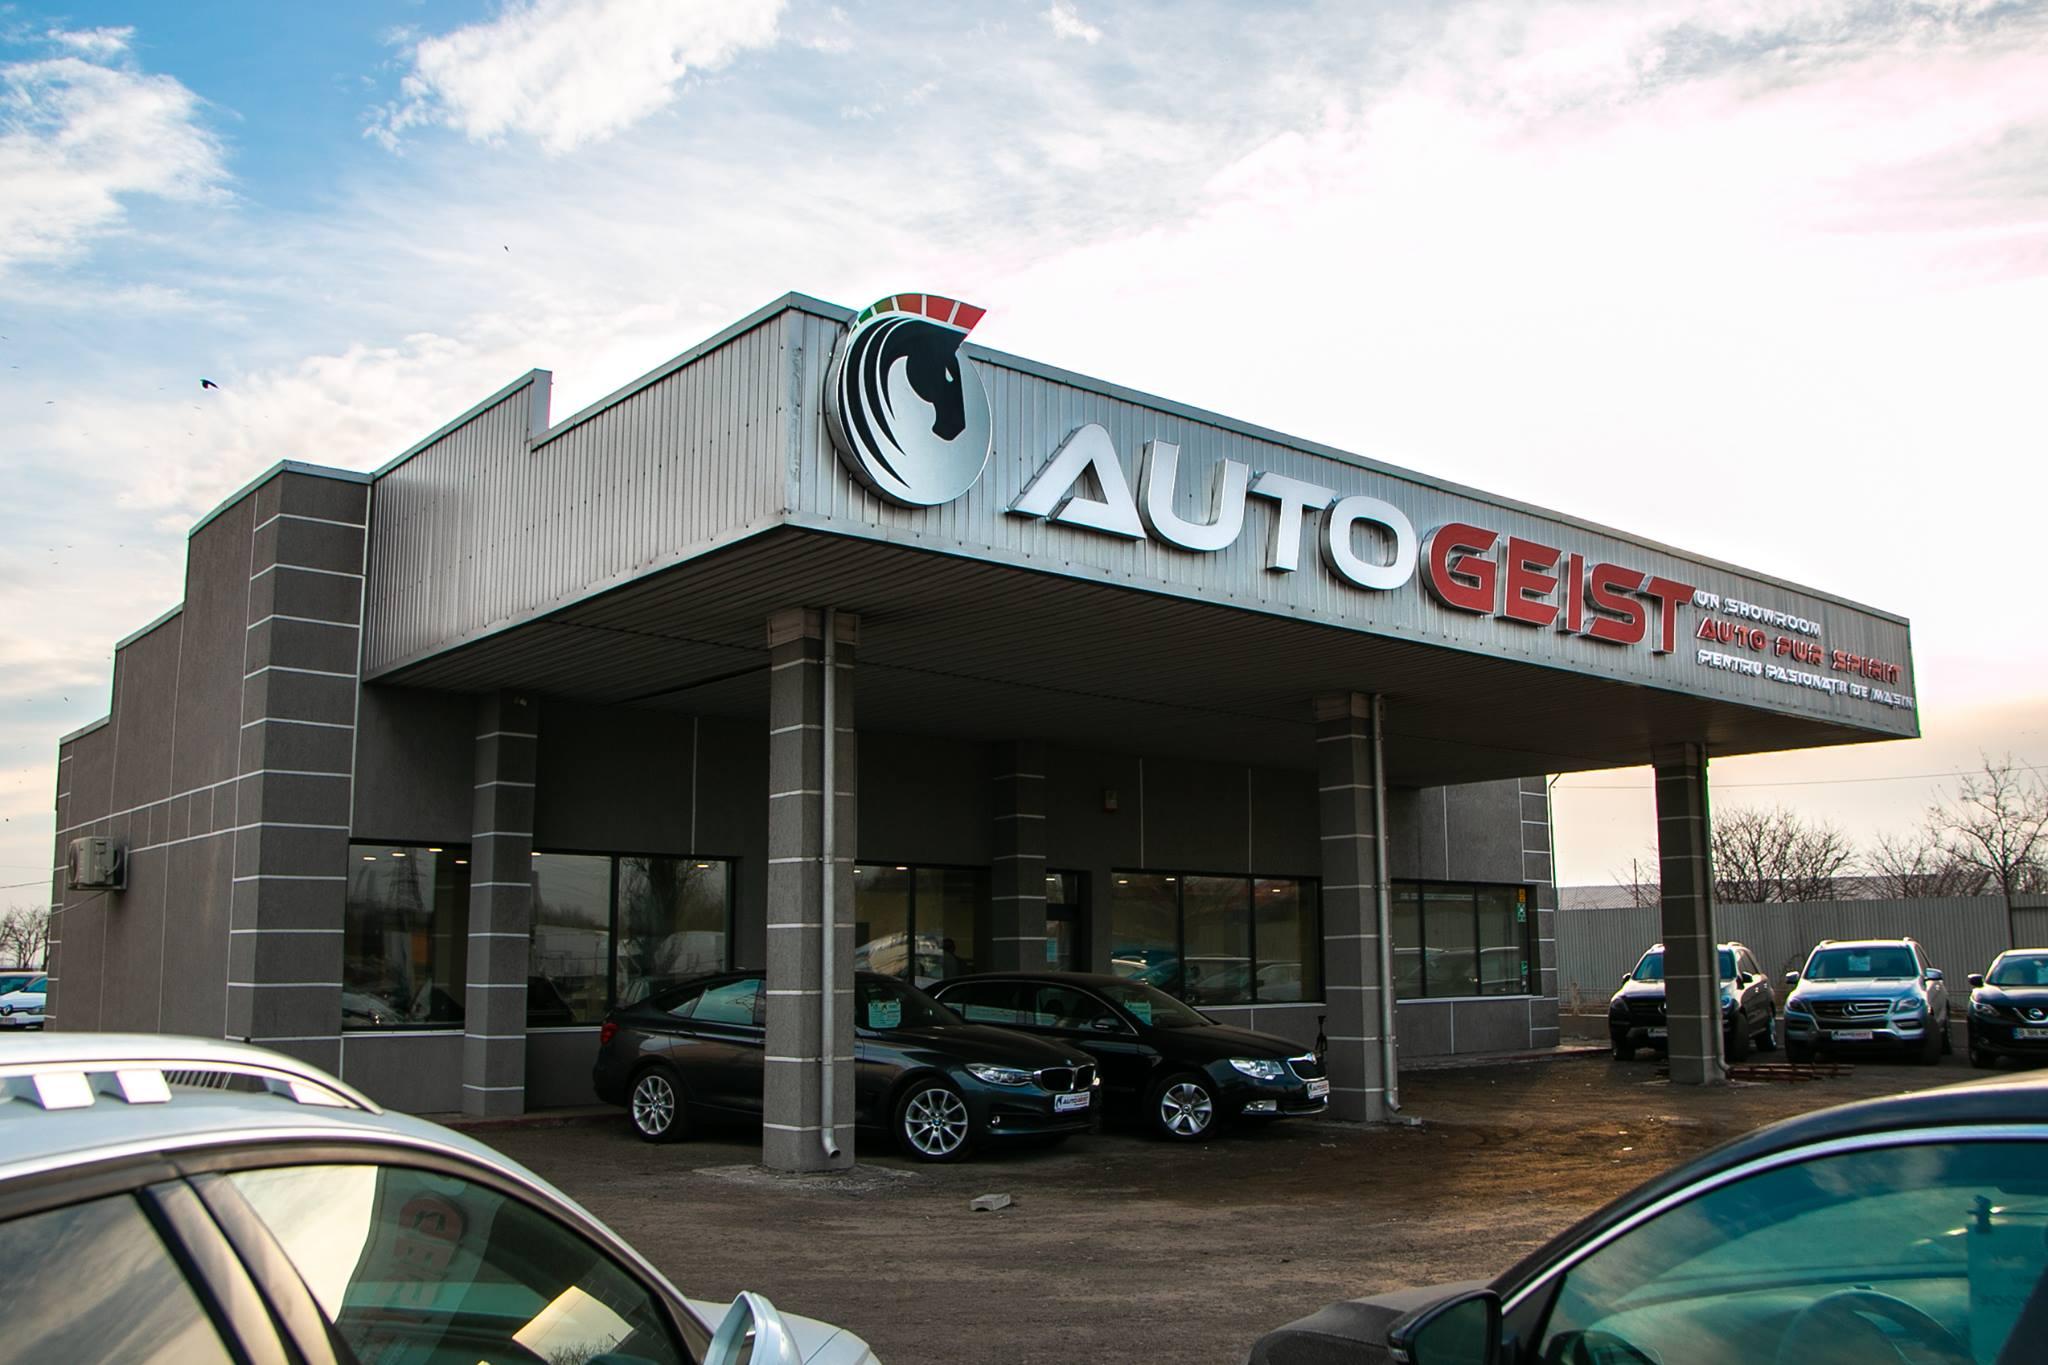 Autogeist – Auto Pur Spirit